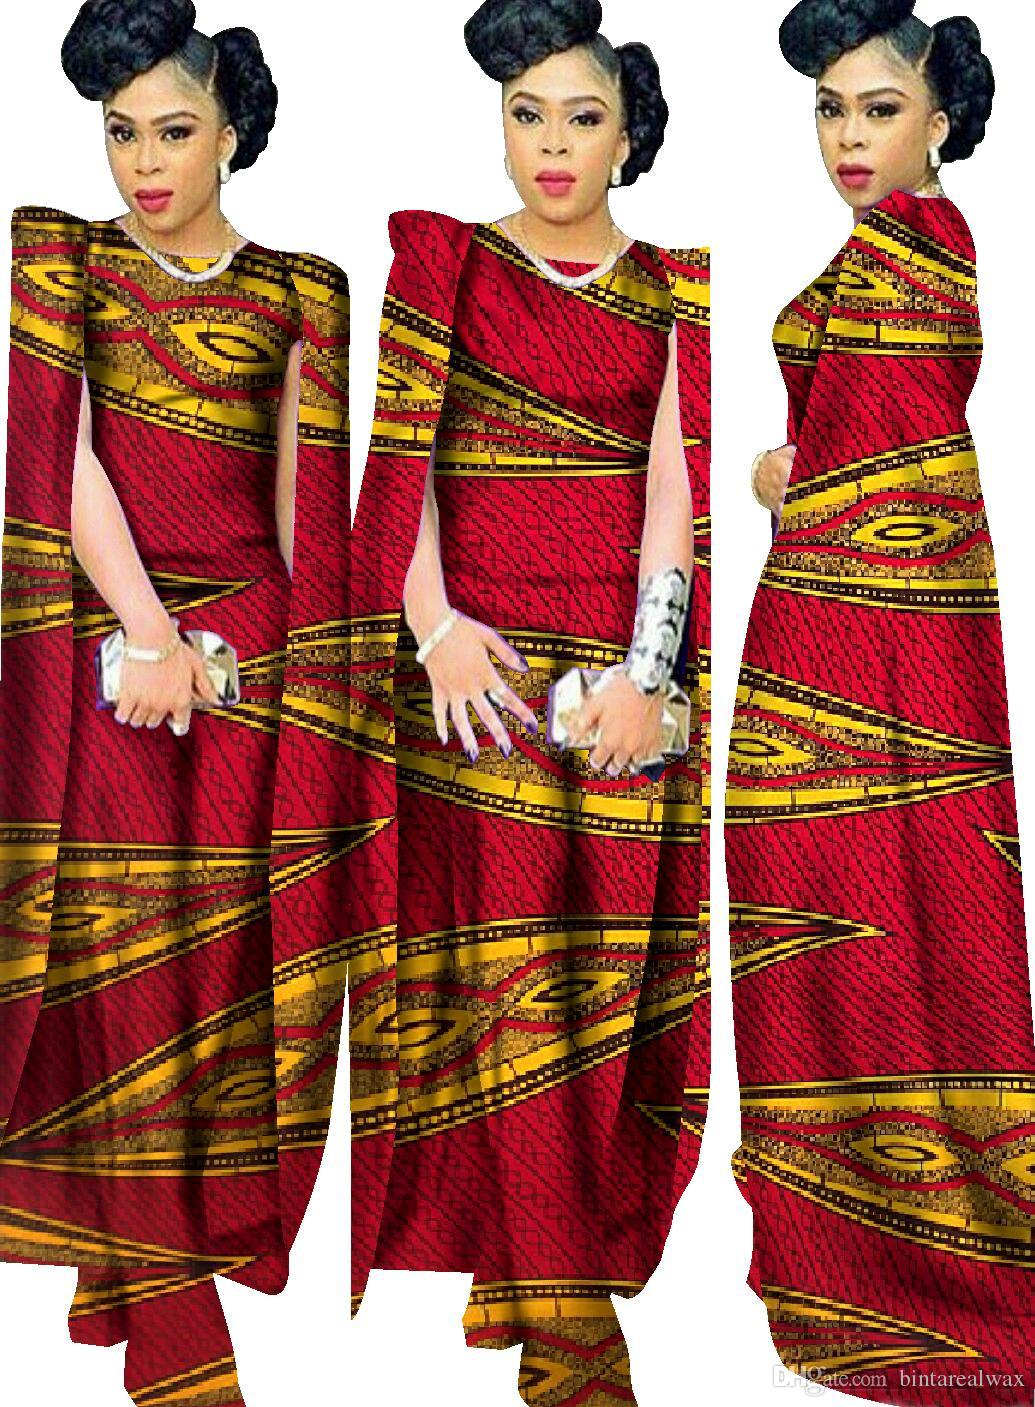 Modern African clothing for men! D'iyanu offers stylish African print clothing for men. Our full selection of men's dashiki tops, African print bow ties, dashiki tops, and African print shopnow-jl6vb8f5.ga our full selection of men's African clothing below.